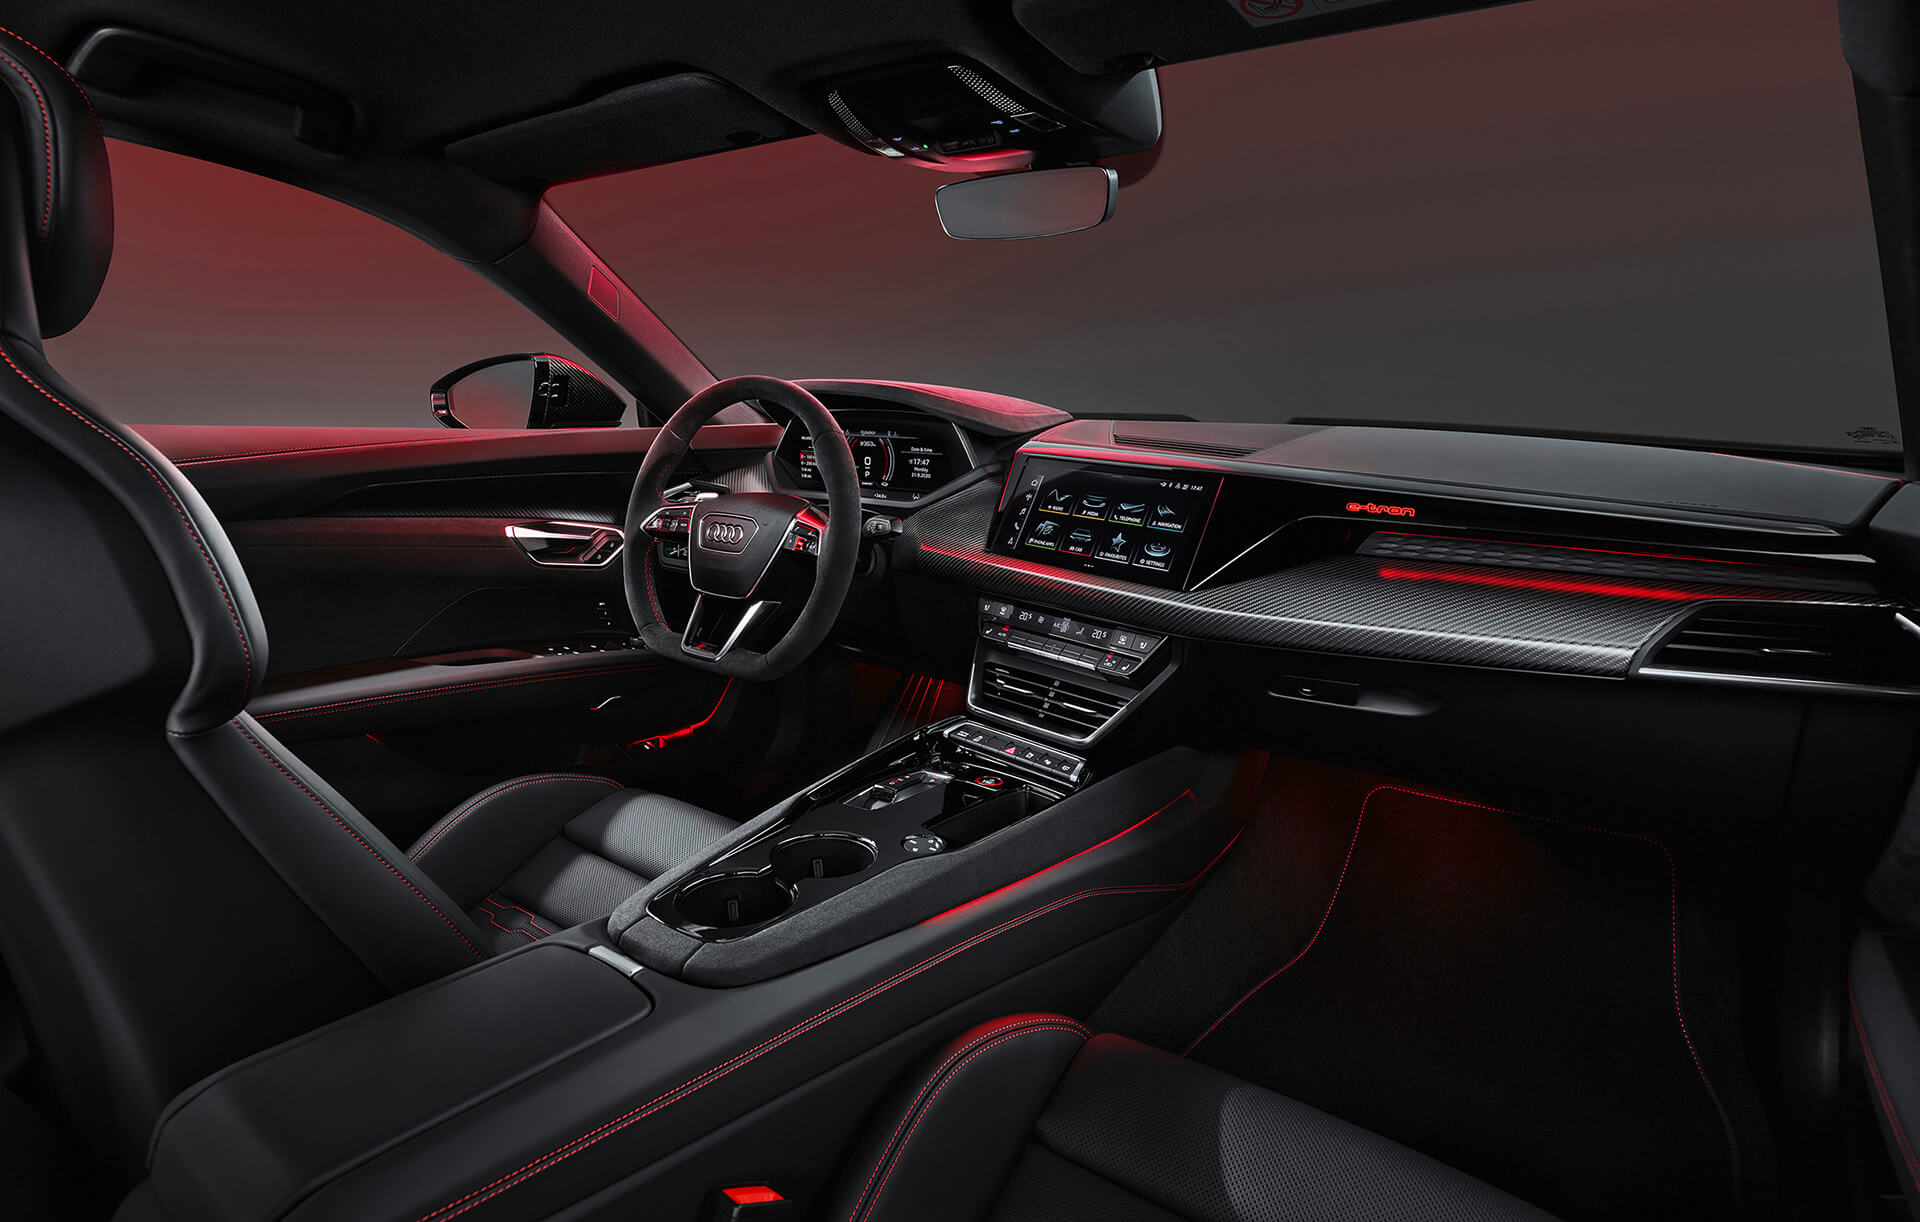 Audi e-tron GT - Εσωτερικό - Infotainment και Audi connect